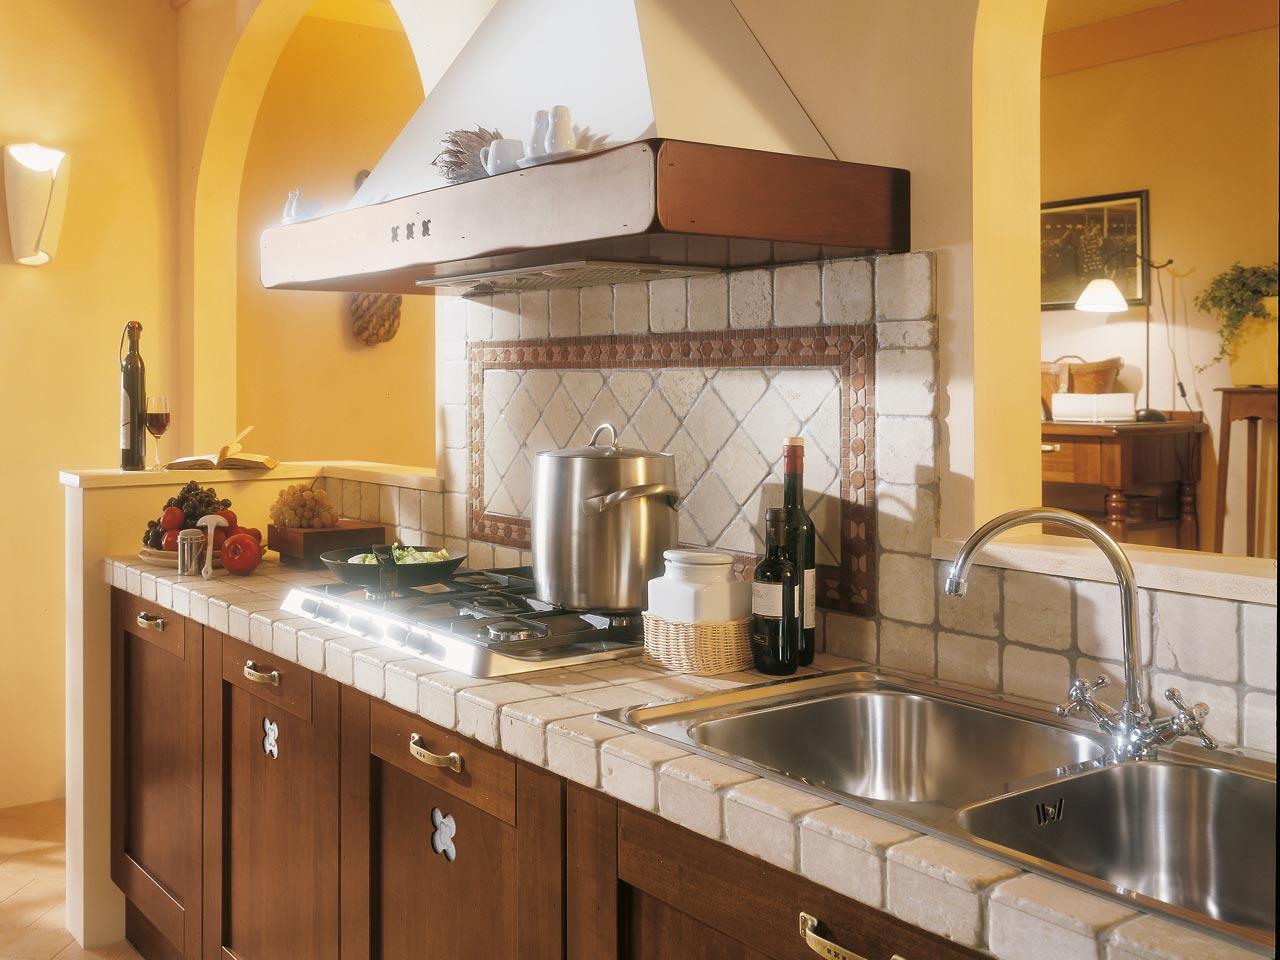 Cucine Finta Muratura Lube. Awesome Cucina Classica Veronica With ...